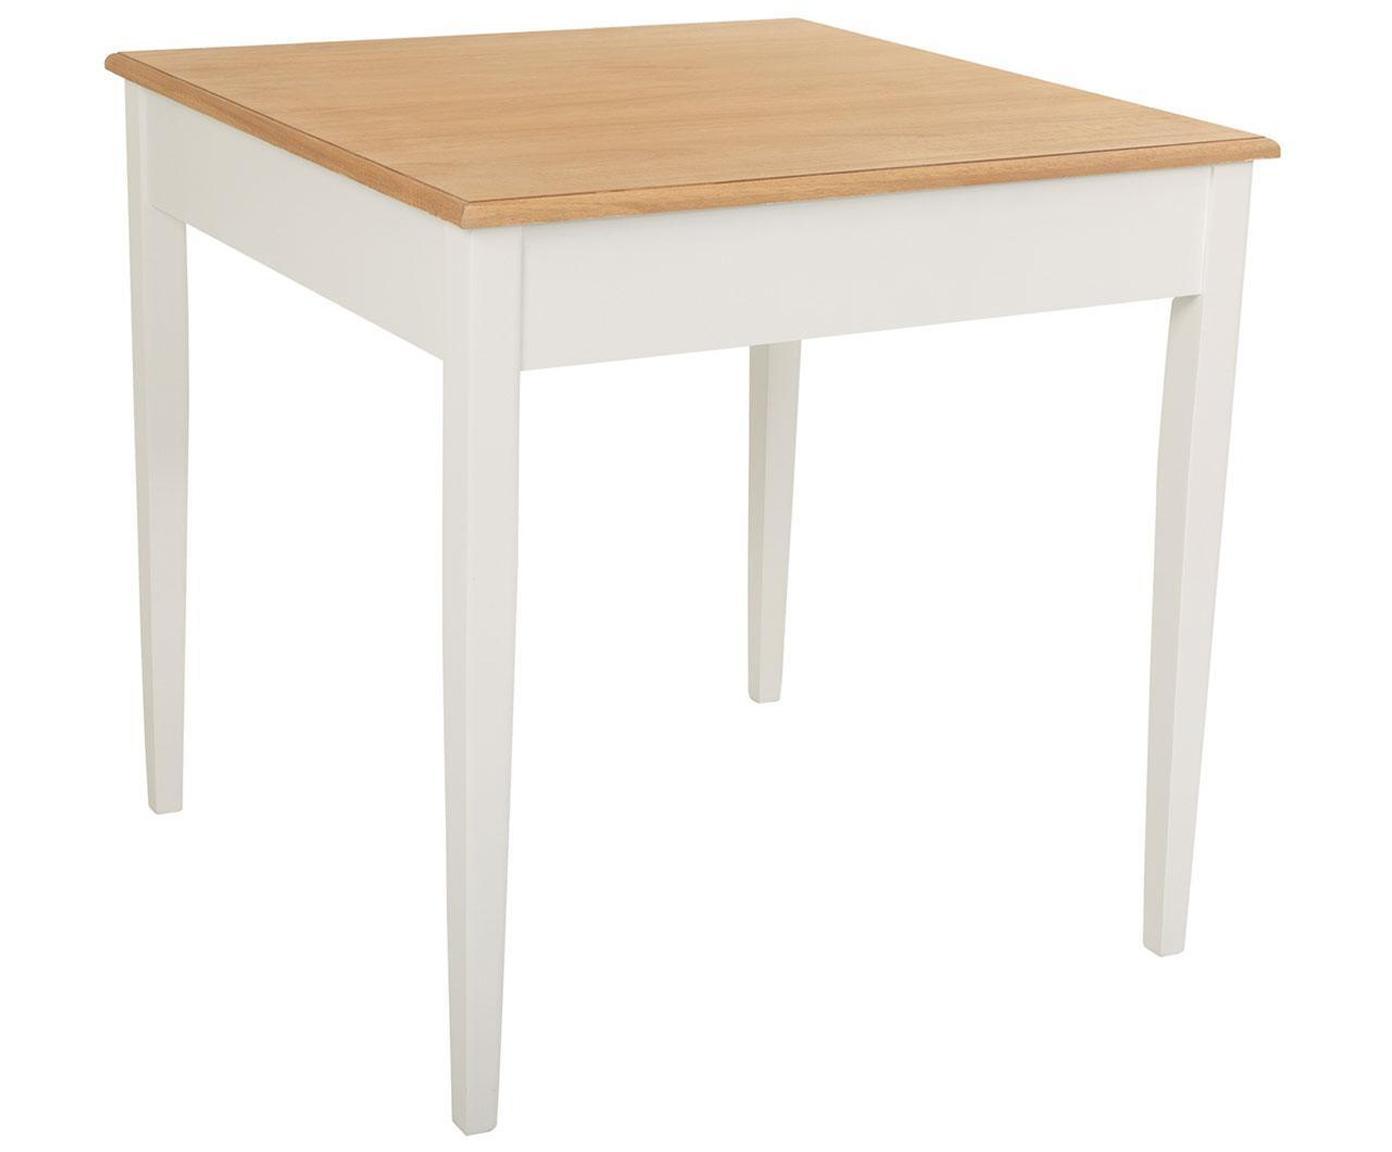 Mesa de comedor Noa, Patas: madera de paulownia, Tablero: fibras de densidad media , Beige, blanco, An 80 x F 80 cm